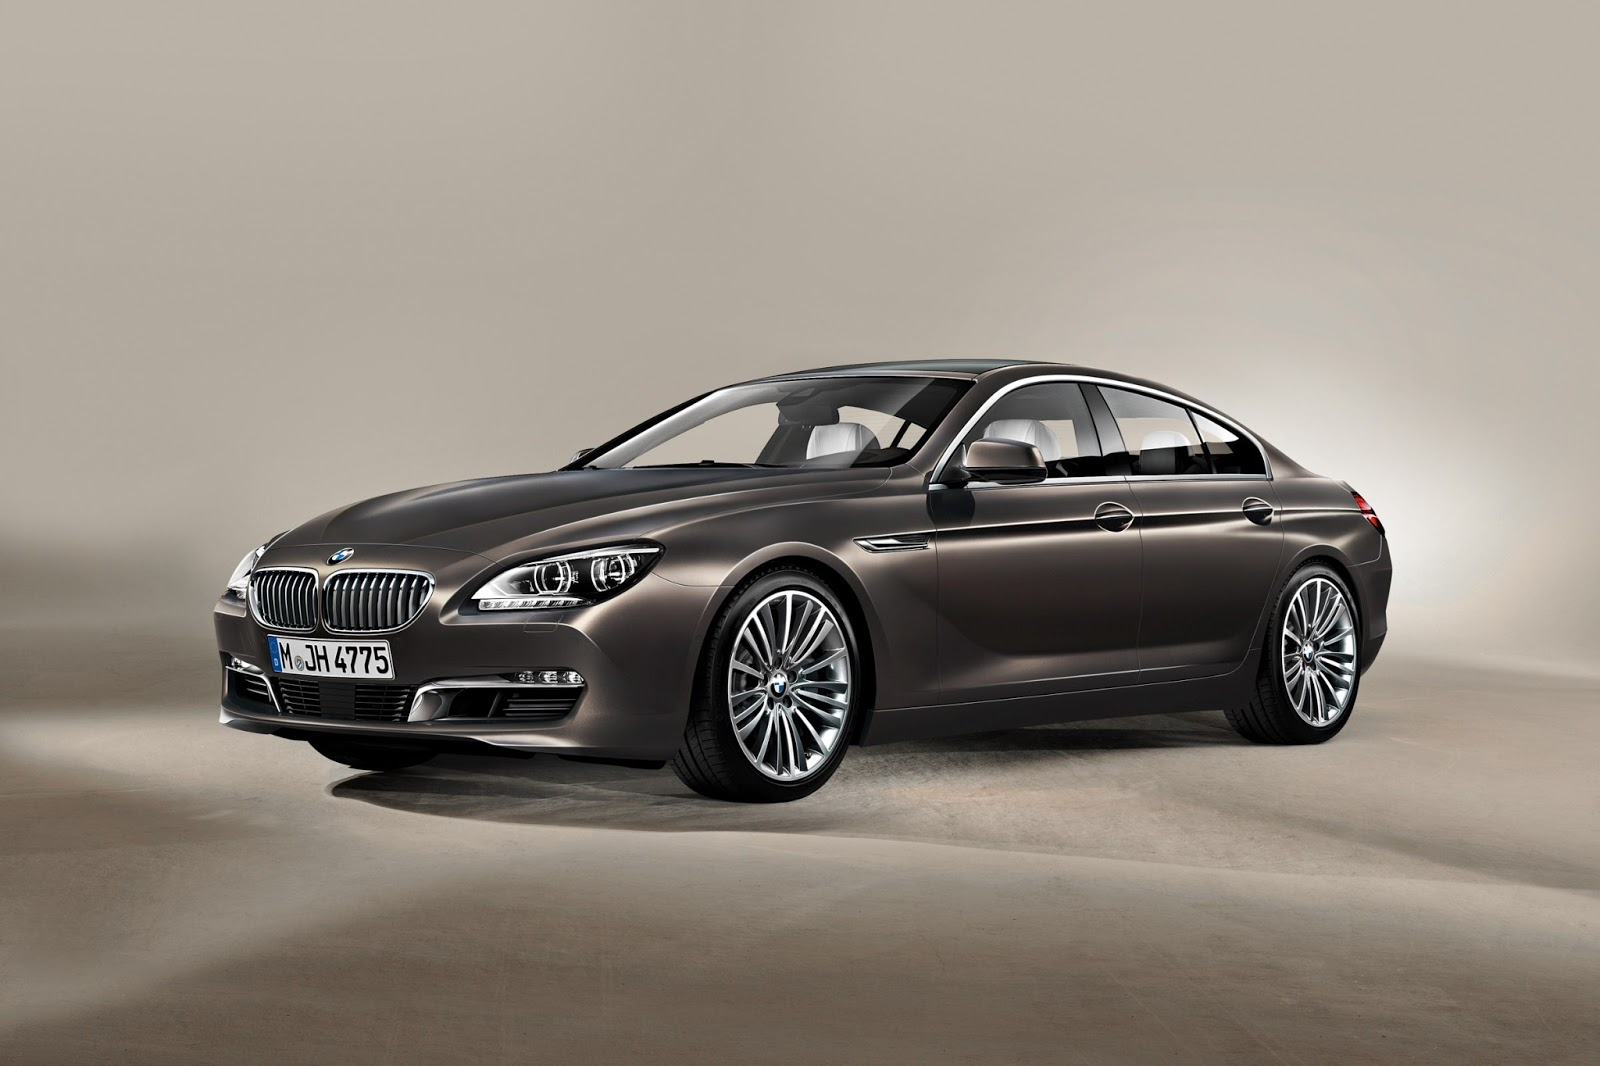 Cars GTO: 2013 BMW 6-Series Gran Coupe